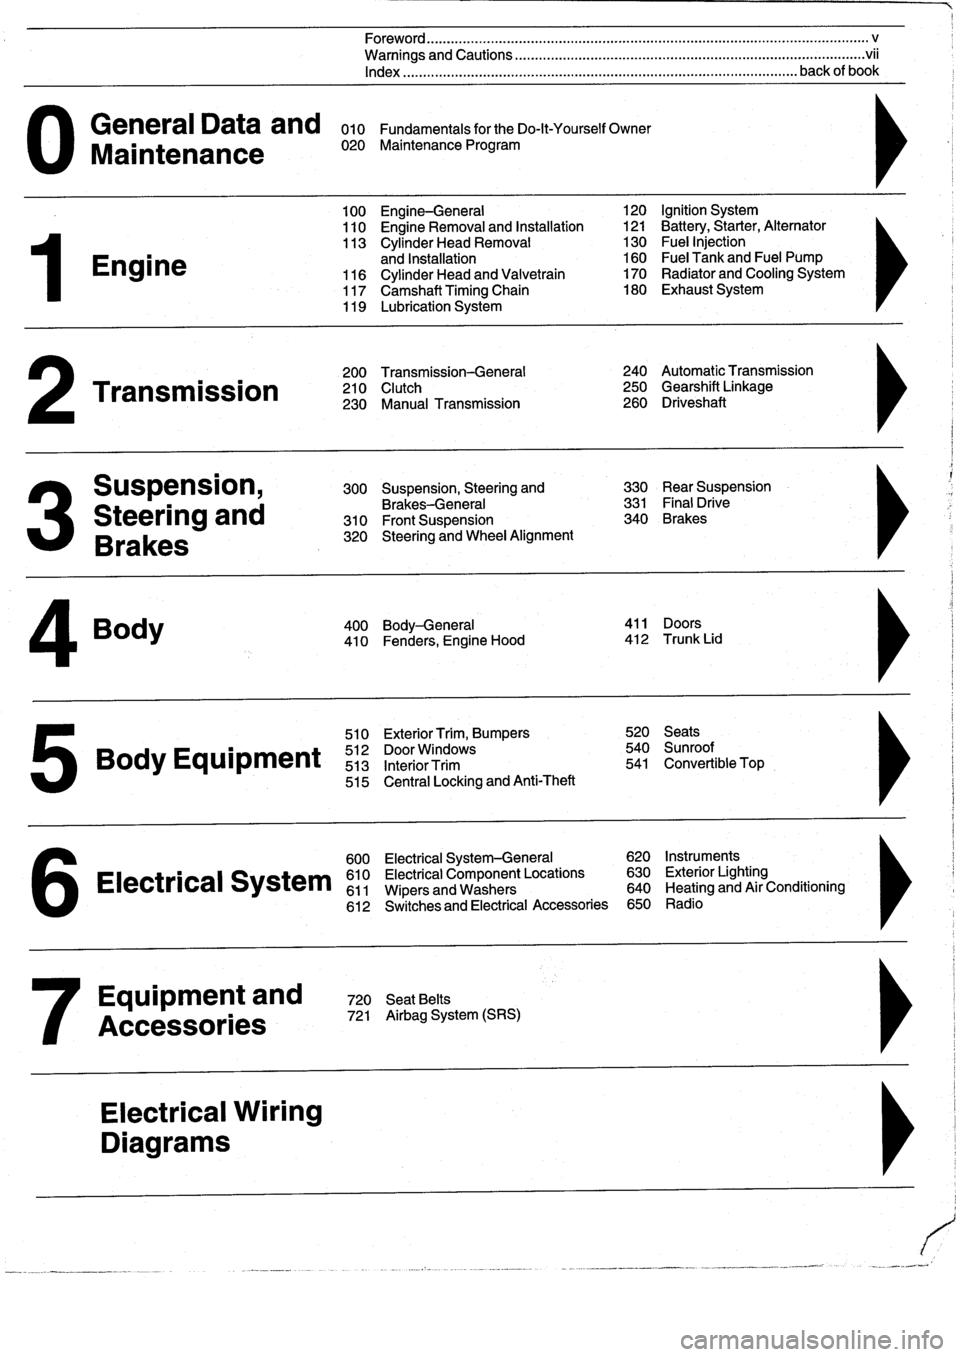 medium resolution of wiring diagram for bmw e36 wiring free wiring diagrams 1998 bmw 328i coupe 1996 bmw 328i